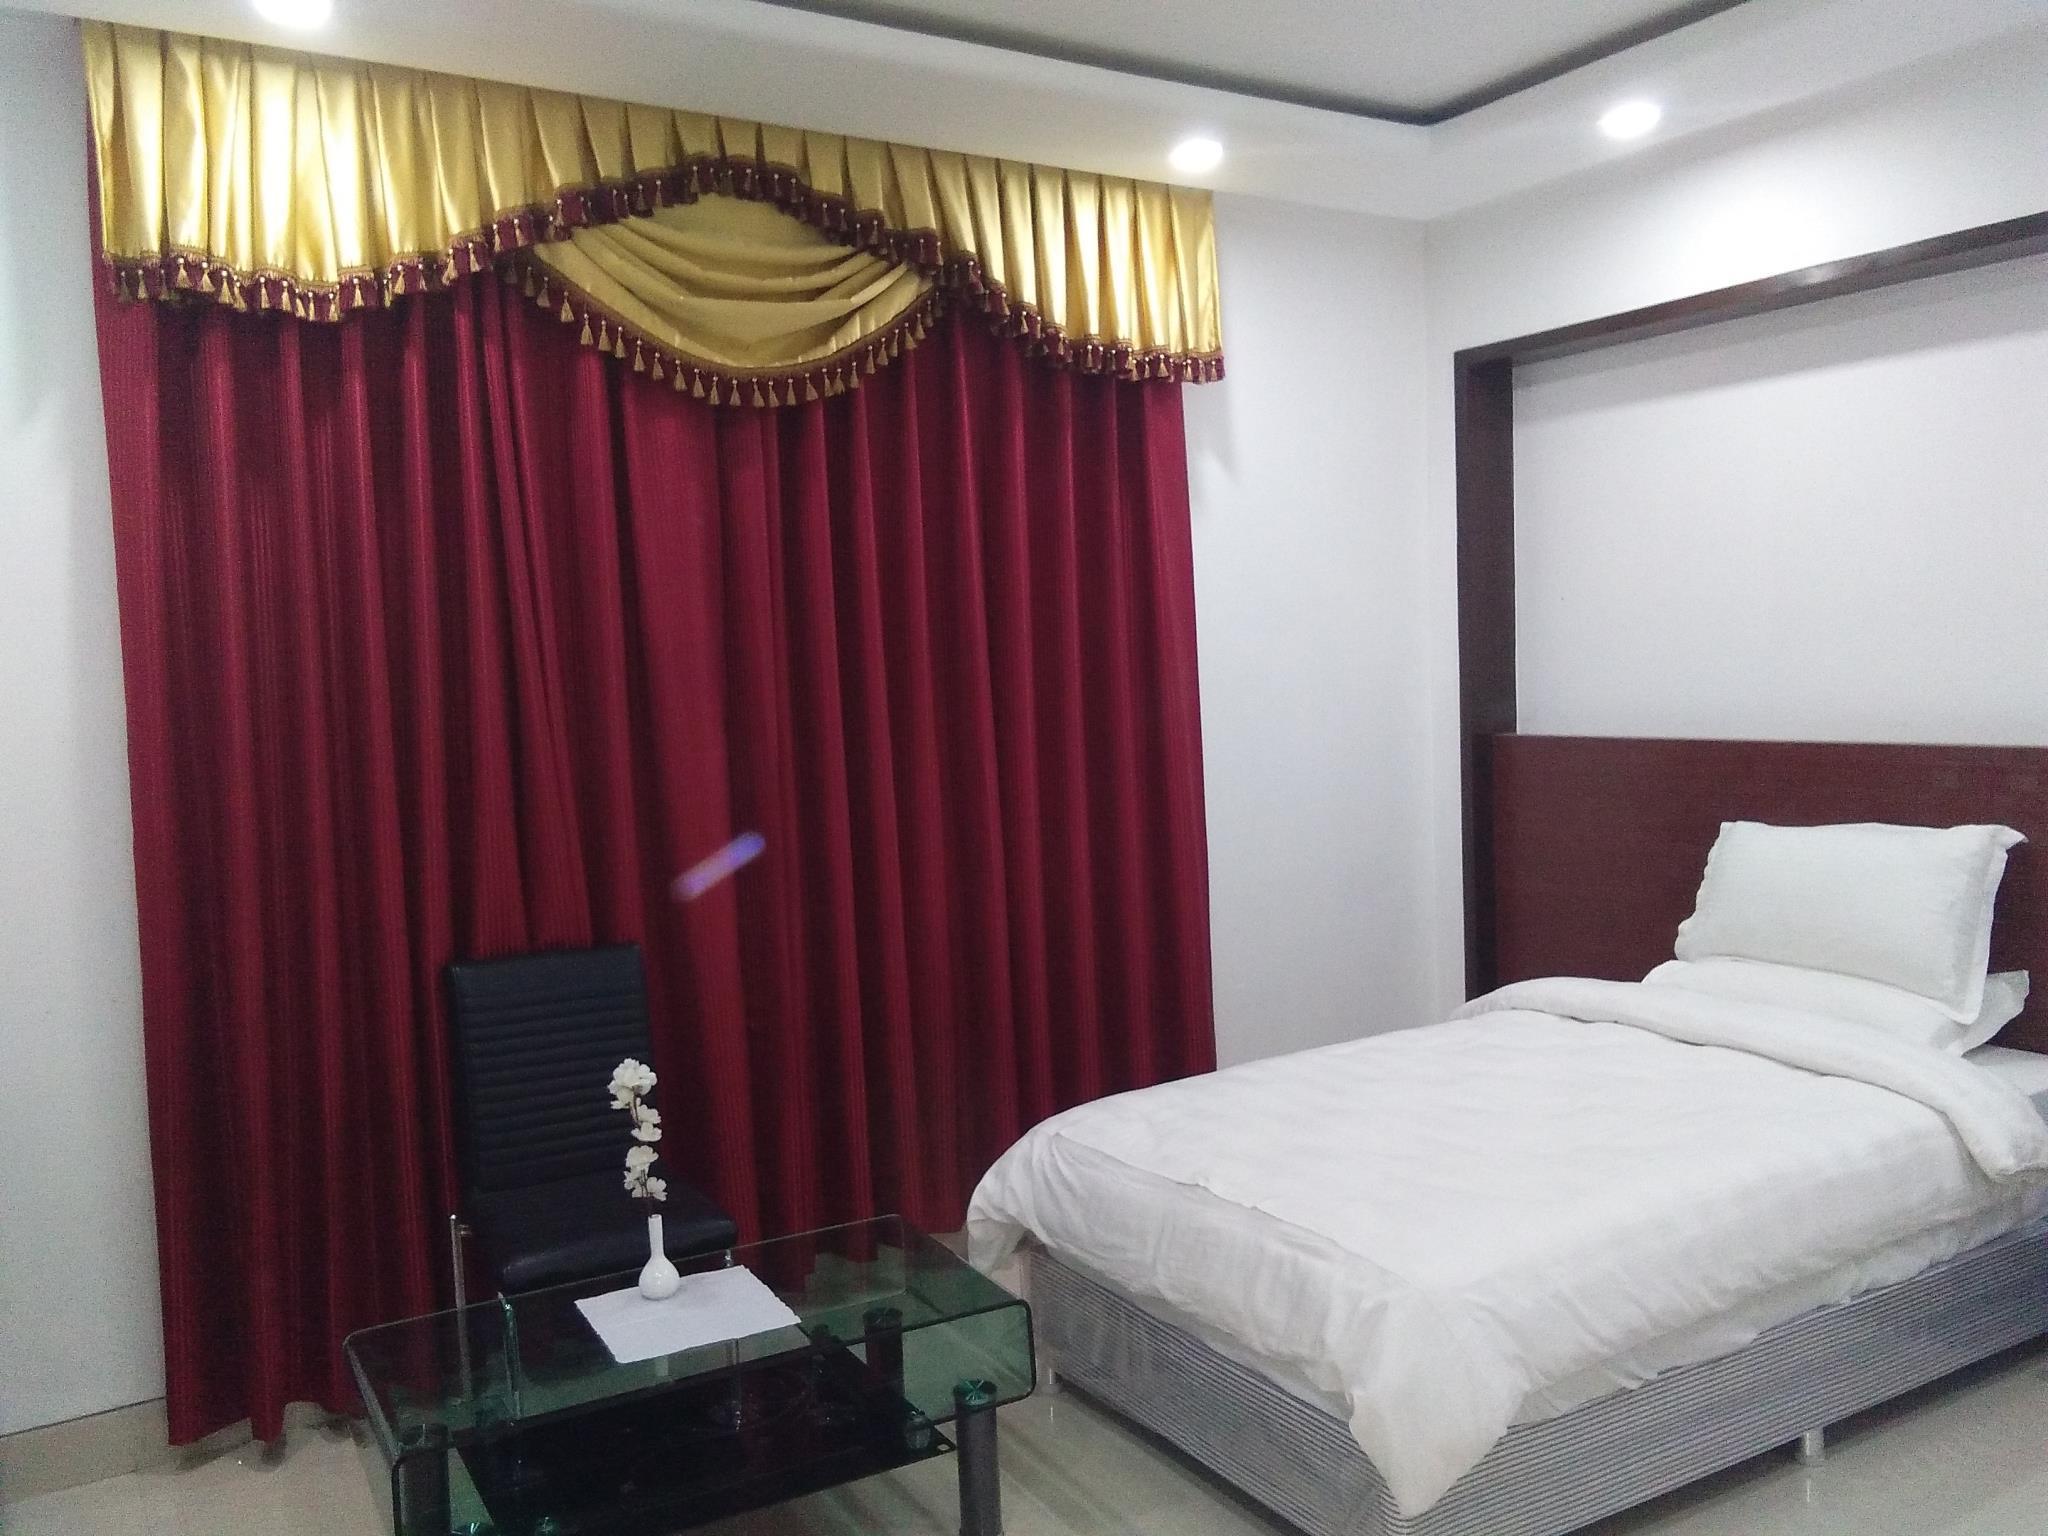 Hotel Seven Inn Reviews